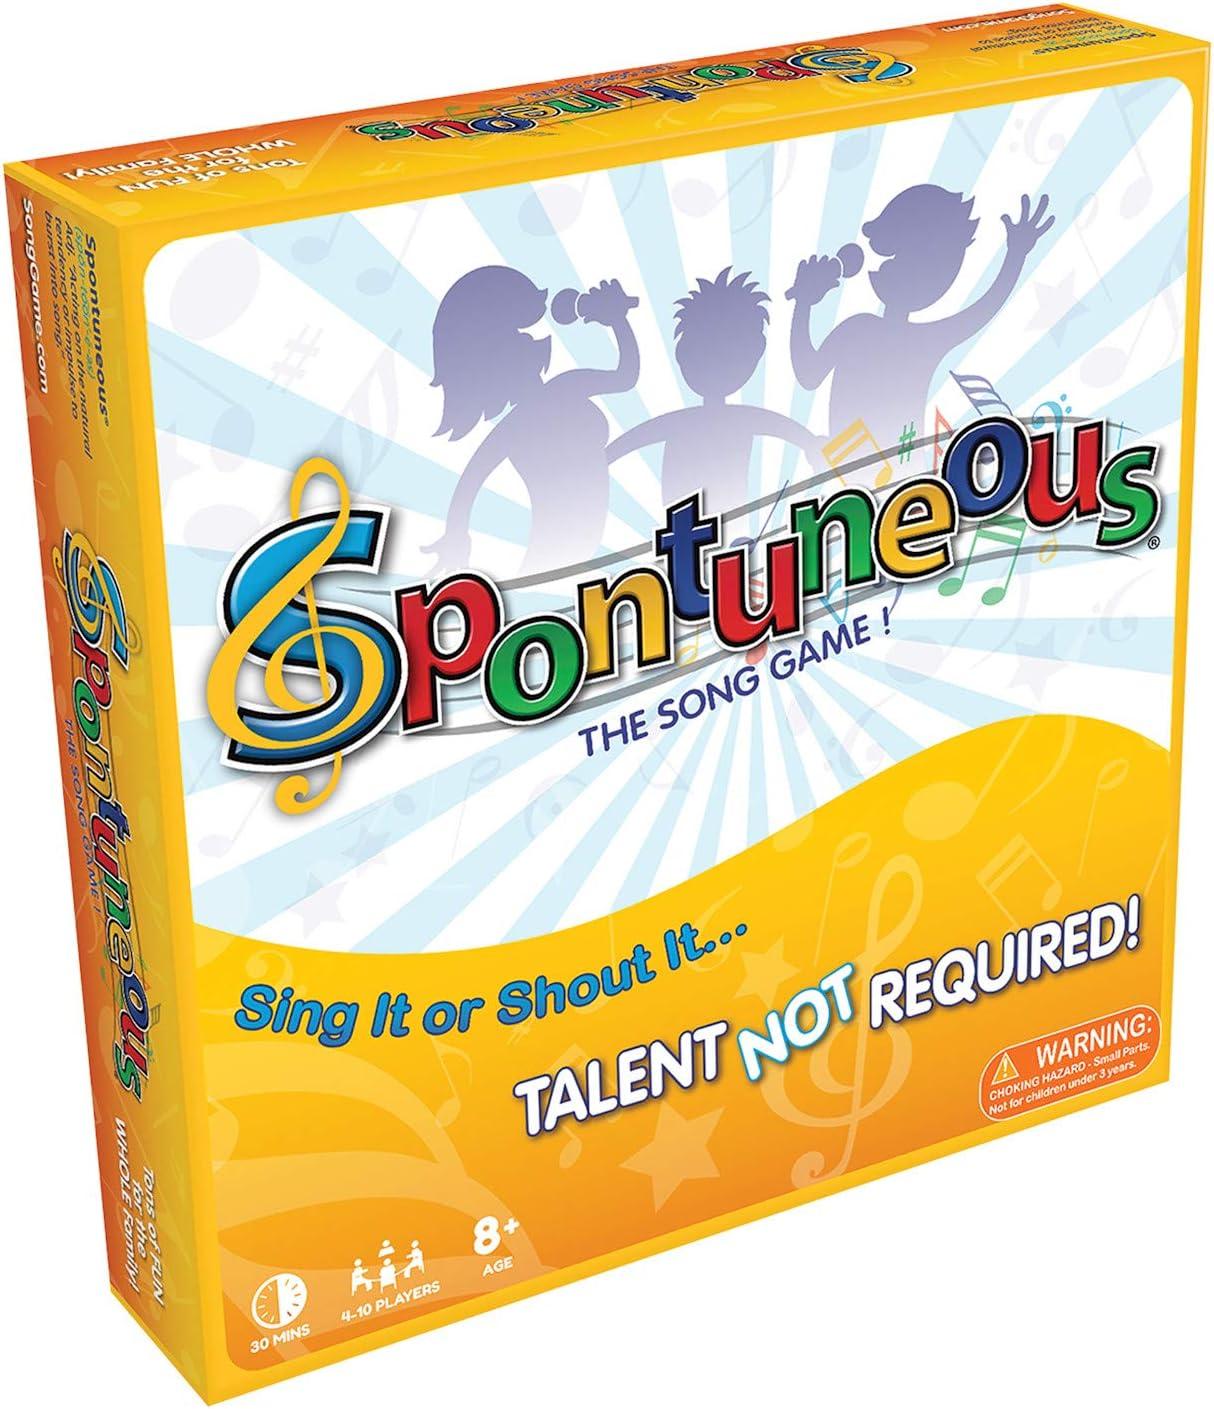 Spontuneous/